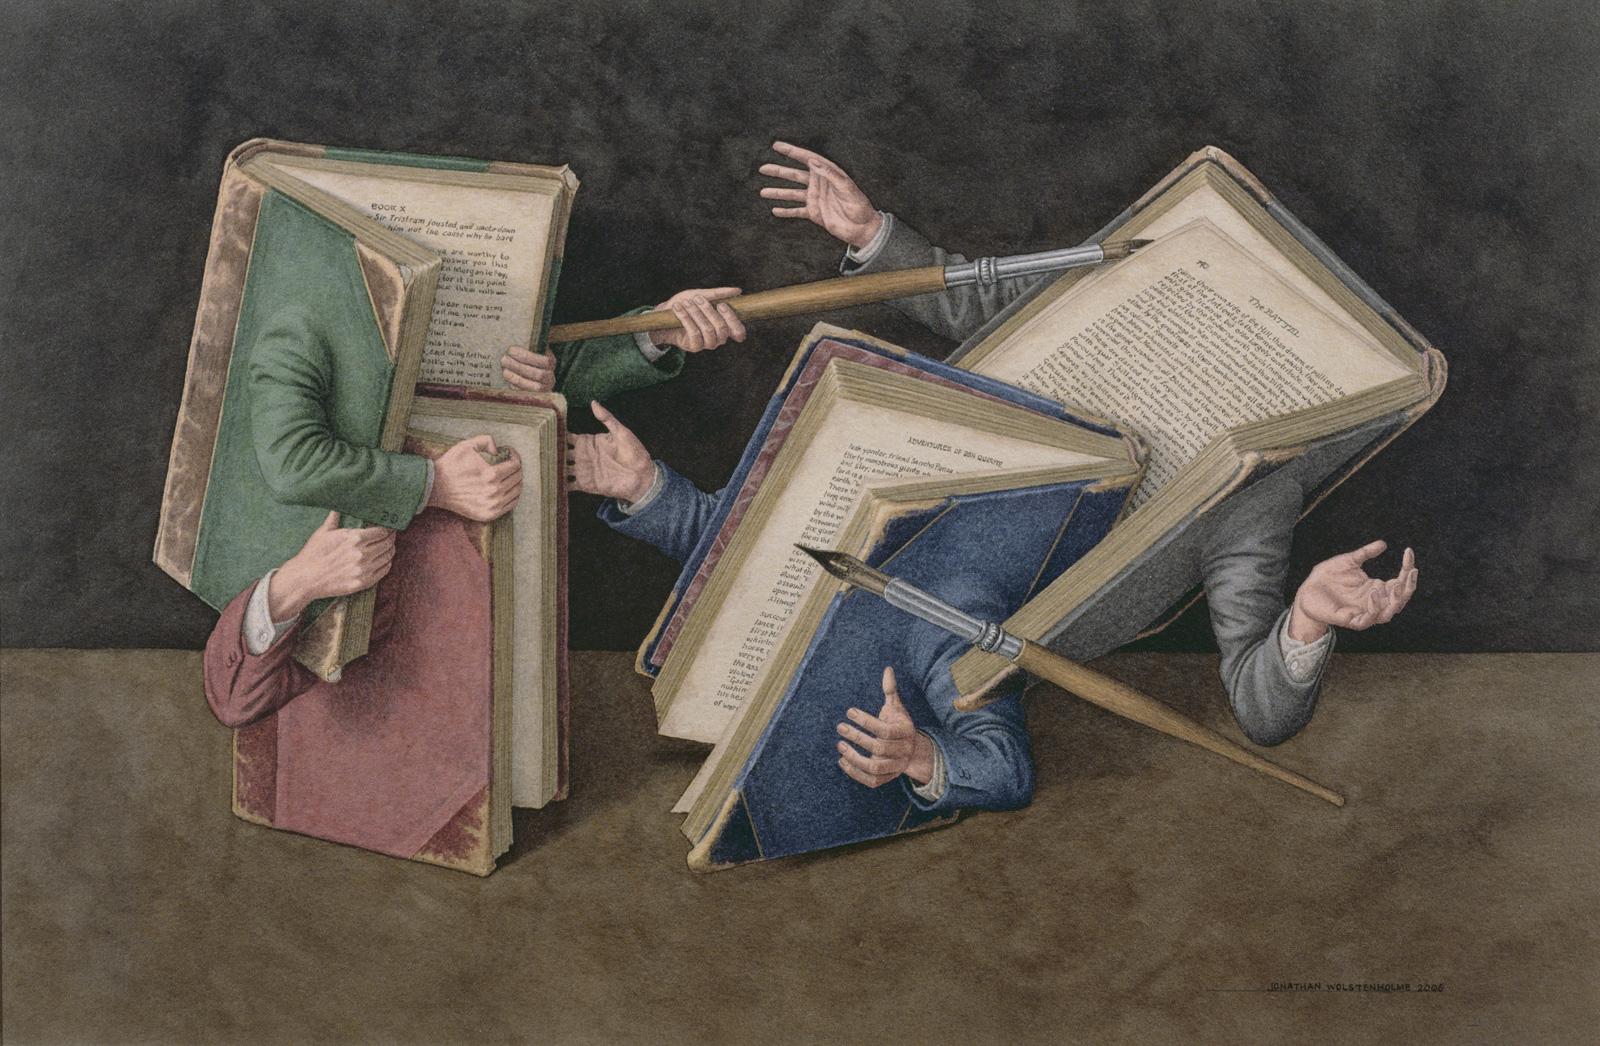 Jonathan Wolstenholme: A Literary Joust, 2006